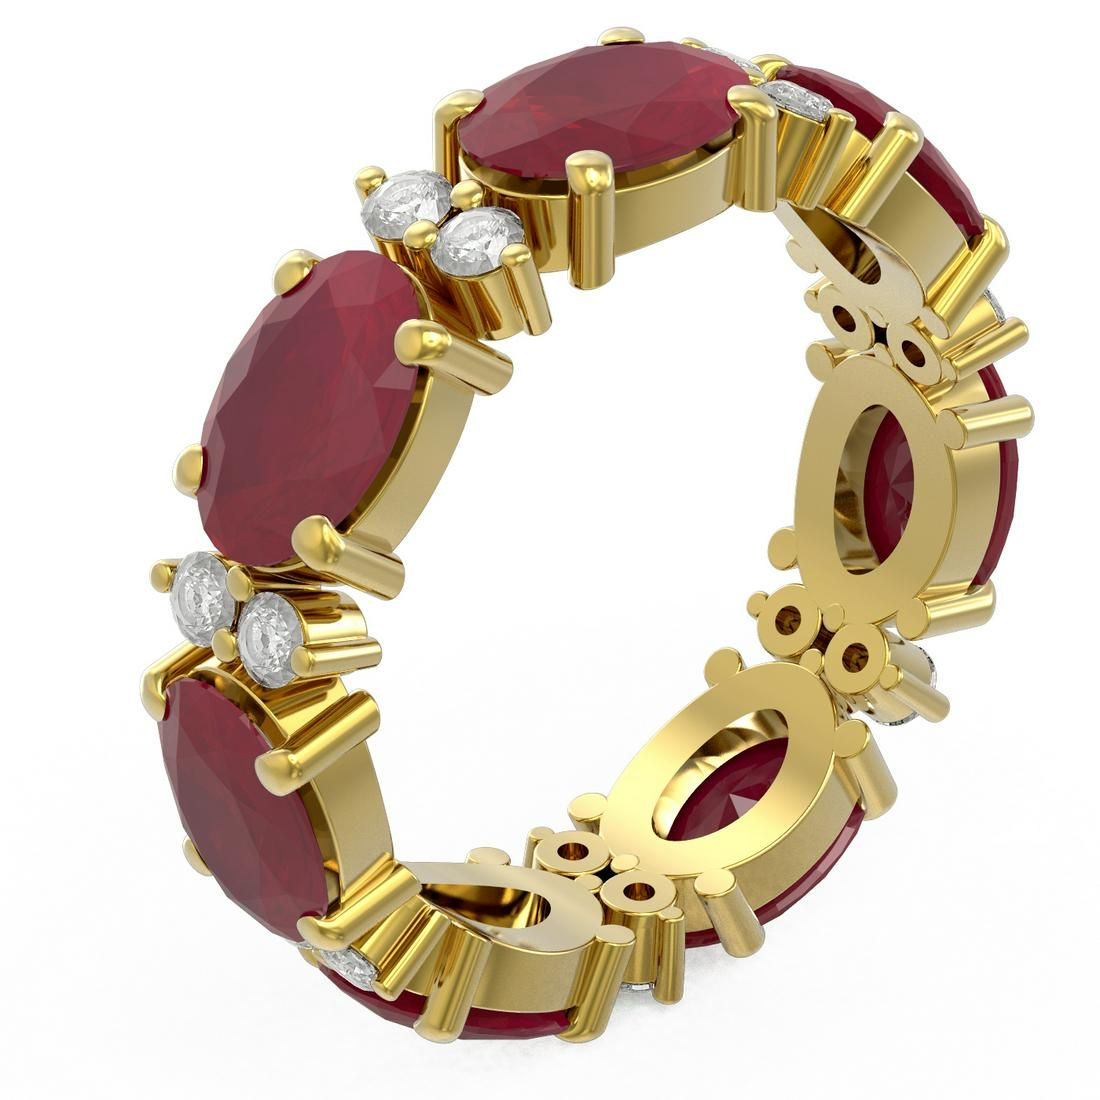 8.62 ctw Ruby Ring 18K Yellow Gold - REF-114N9F